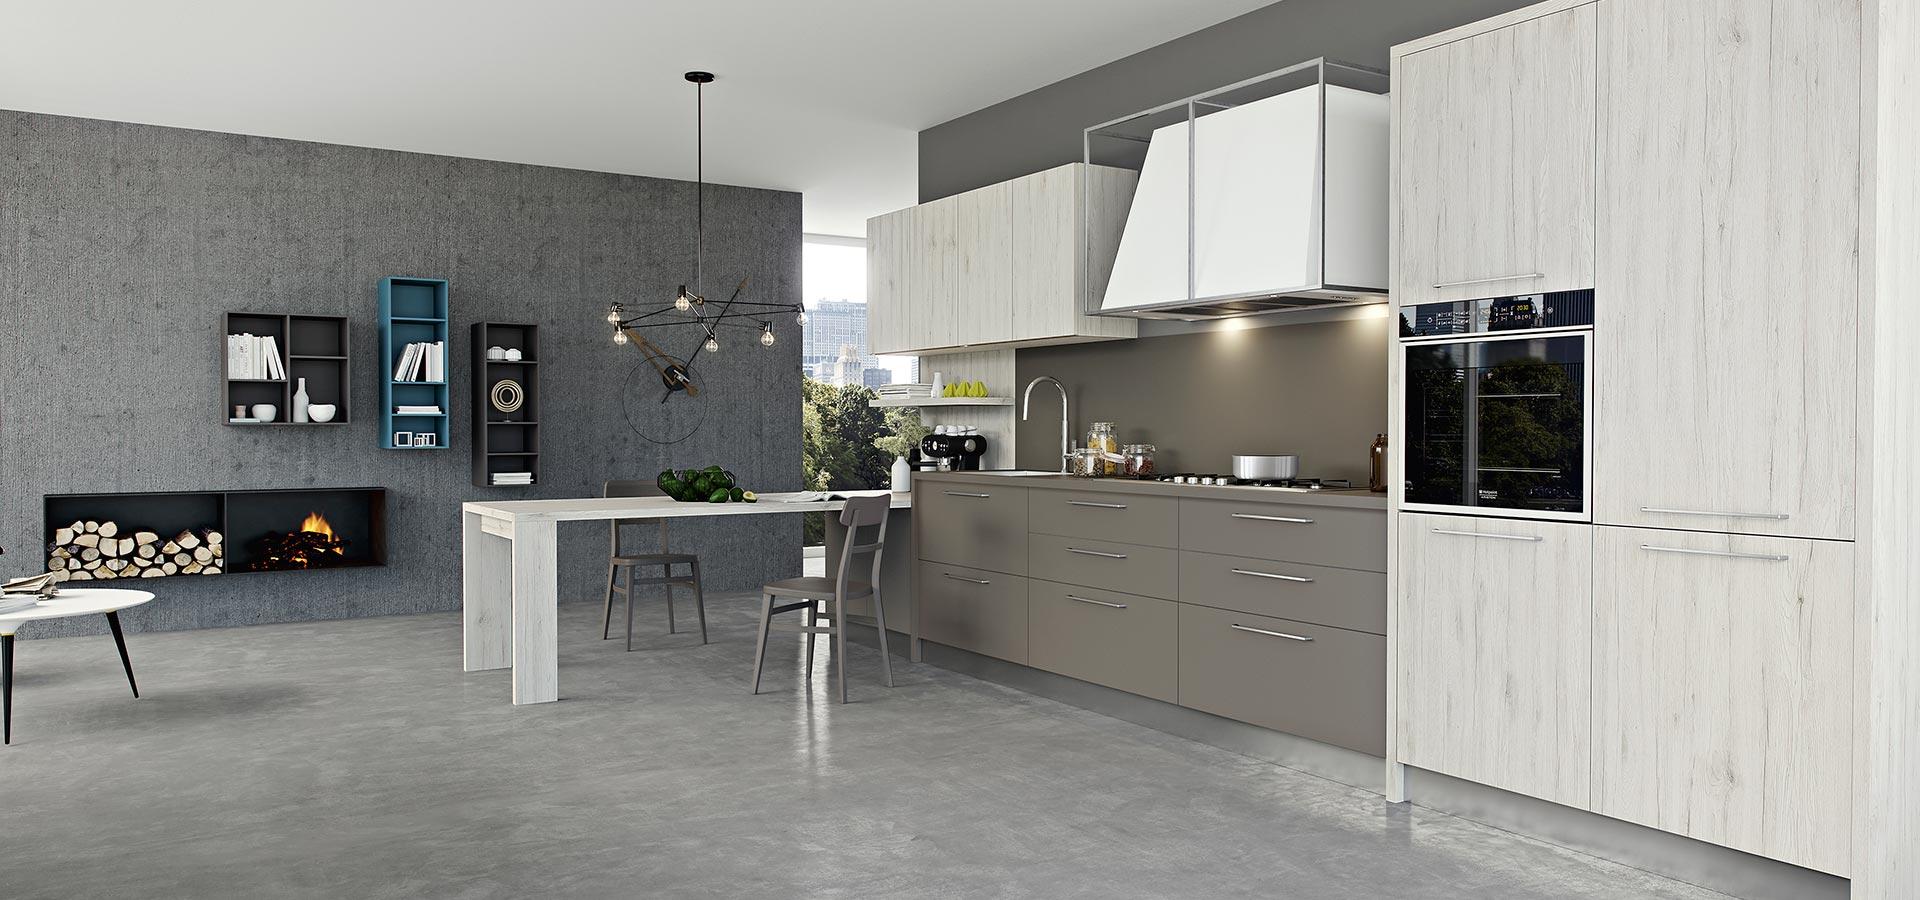 Kali modern kitchen arredo3 for Arredo3 kali